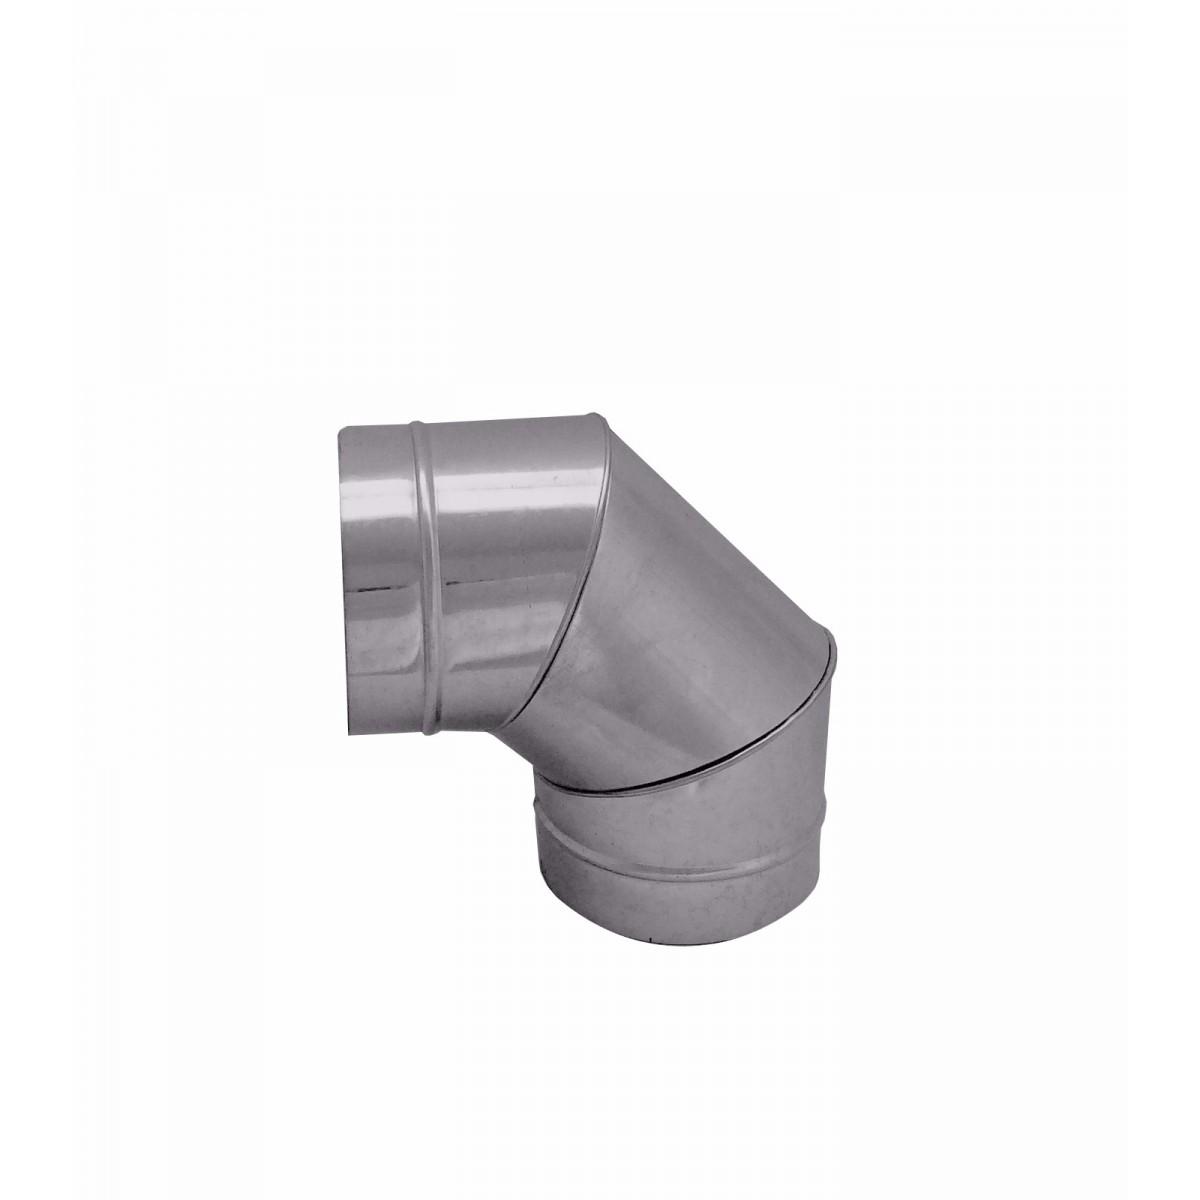 Curva / cotovelo galvanizada 90° de 200 mm de diâmetro  - Galvocalhas